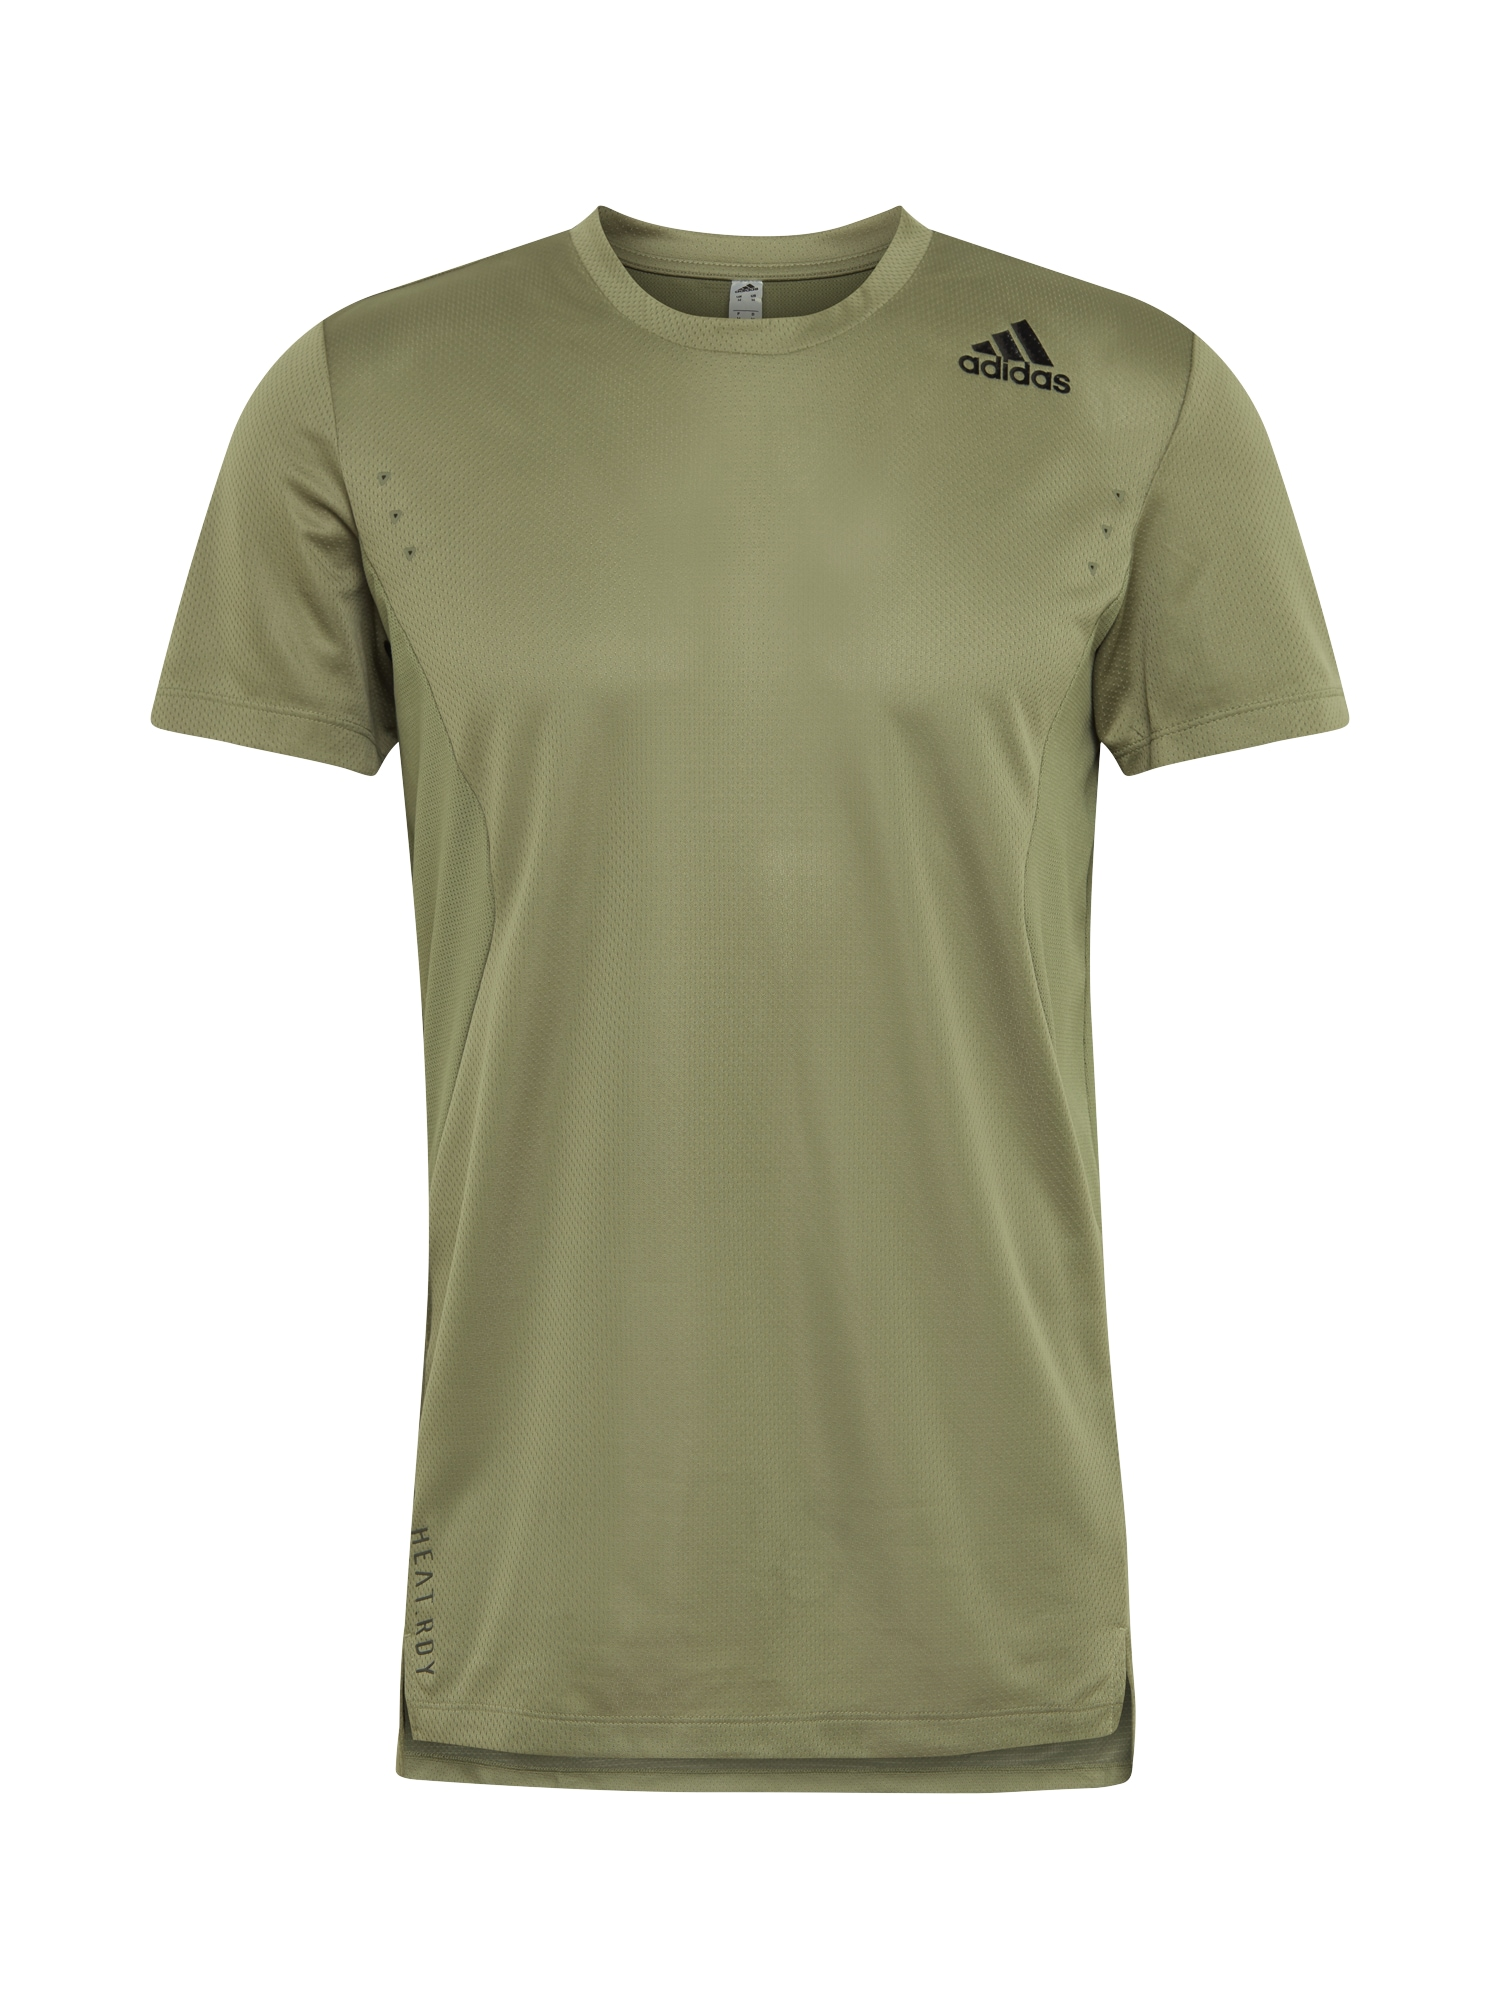 ADIDAS PERFORMANCE Funkčné tričko  olivová / zelená / kaki